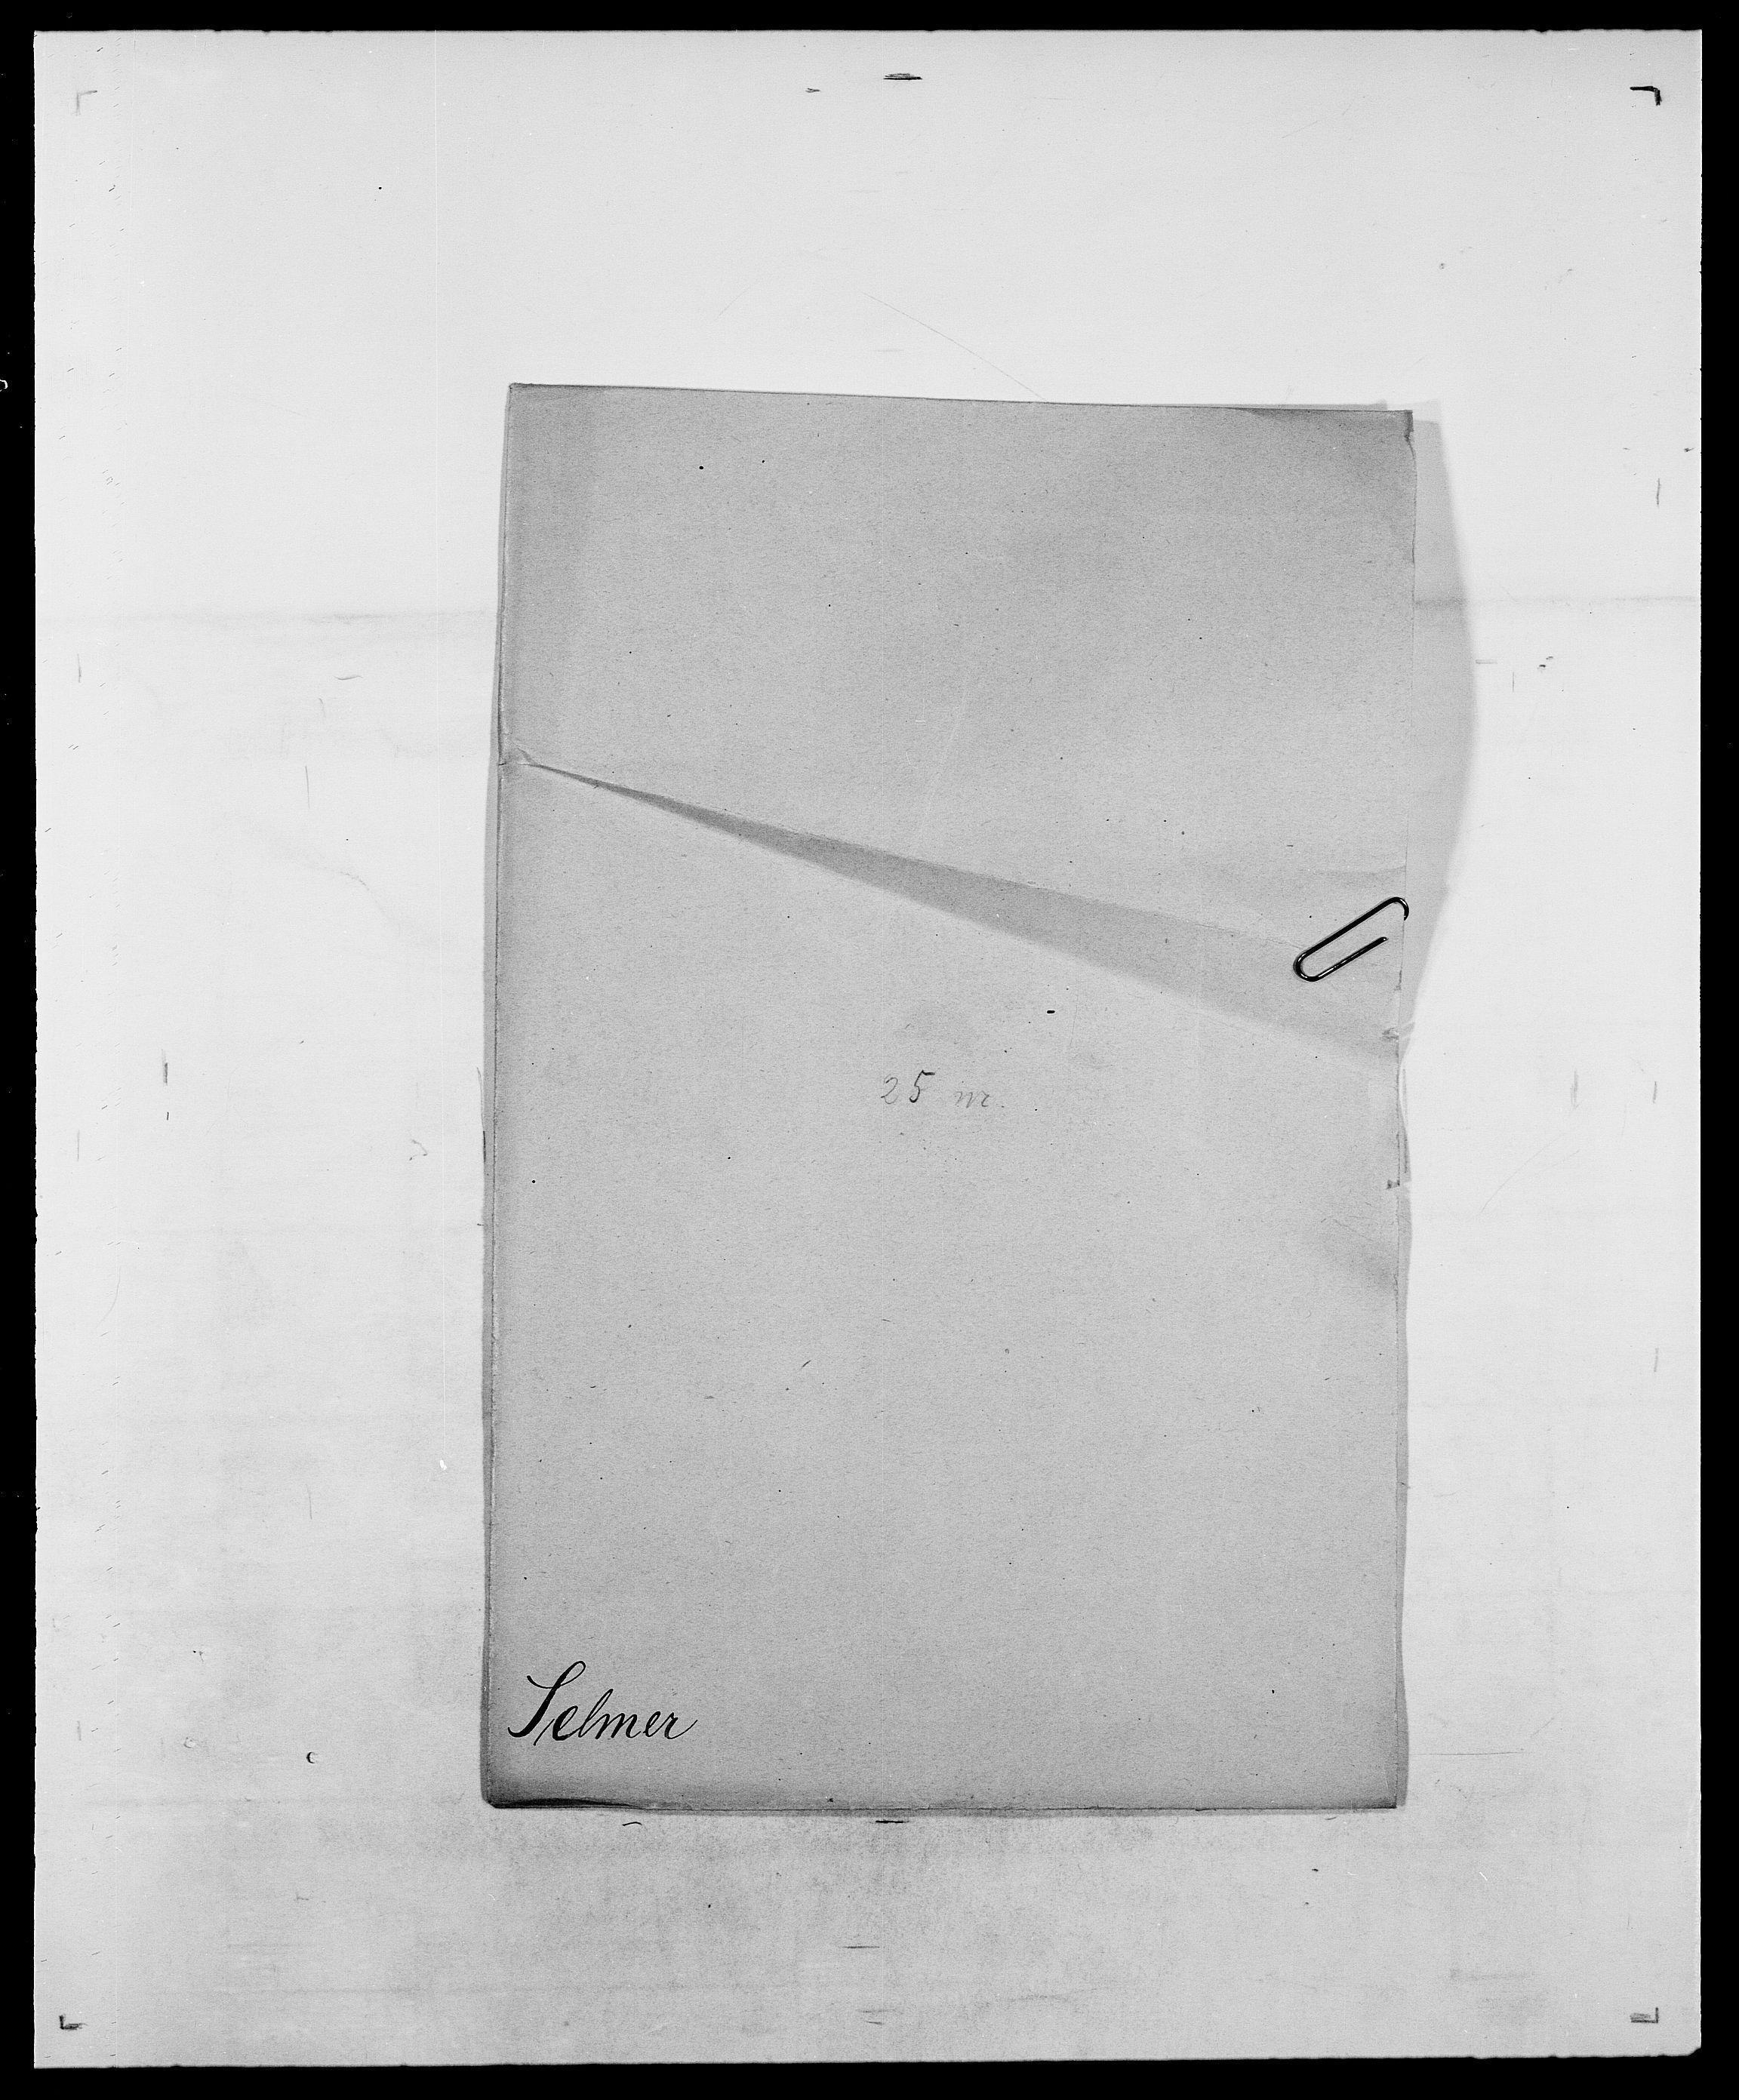 SAO, Delgobe, Charles Antoine - samling, D/Da/L0035: Schnabel - sjetman, s. 643